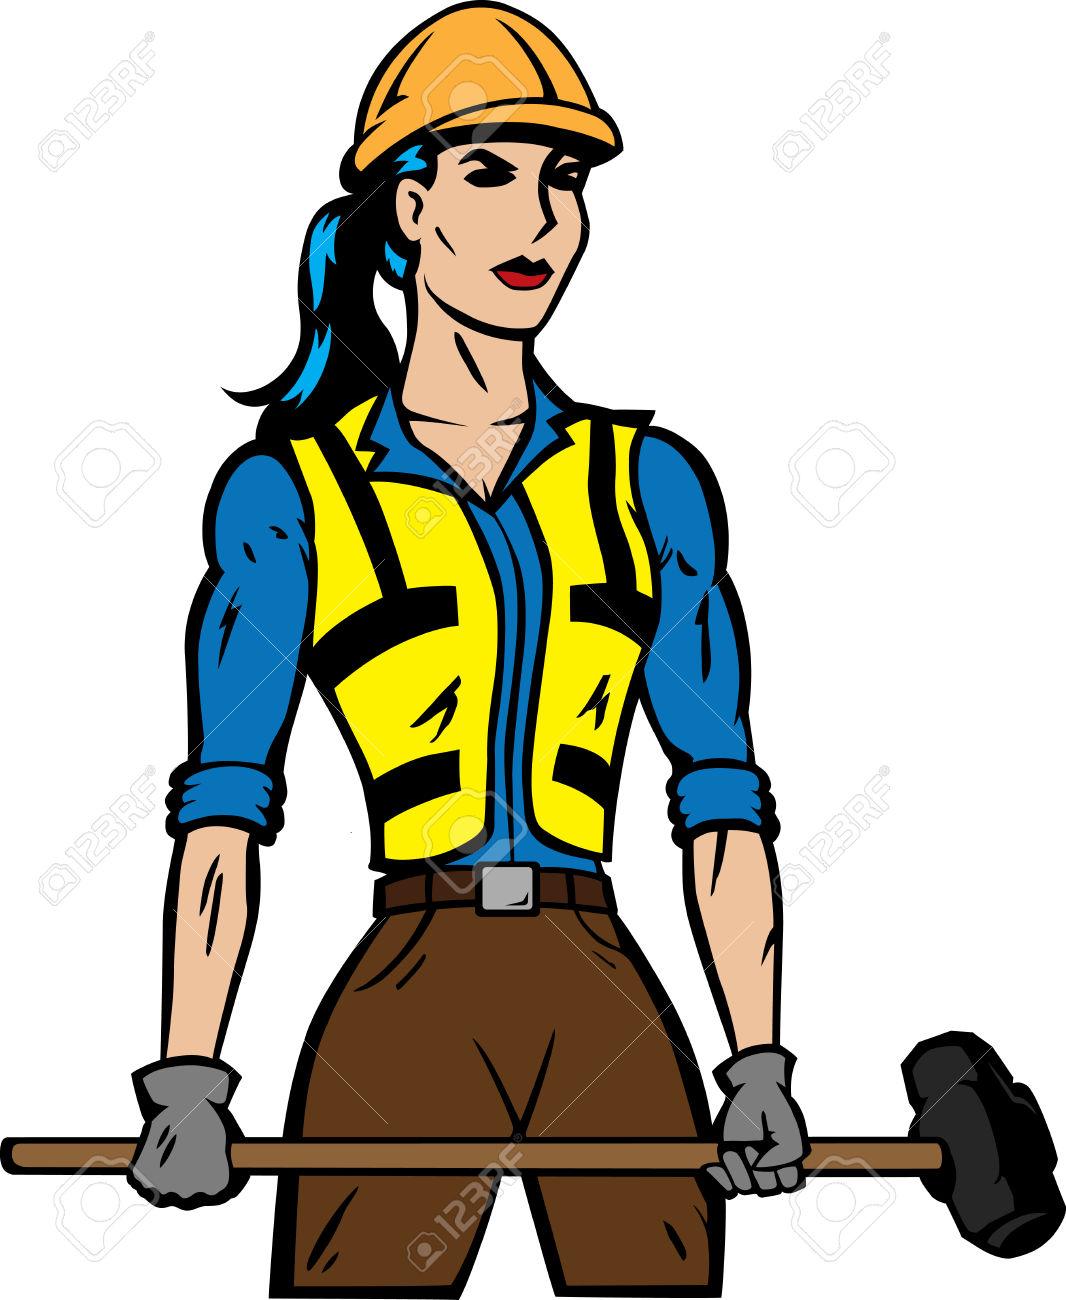 Woman clipart carpenter Clipart Hammer With Hammer Woman